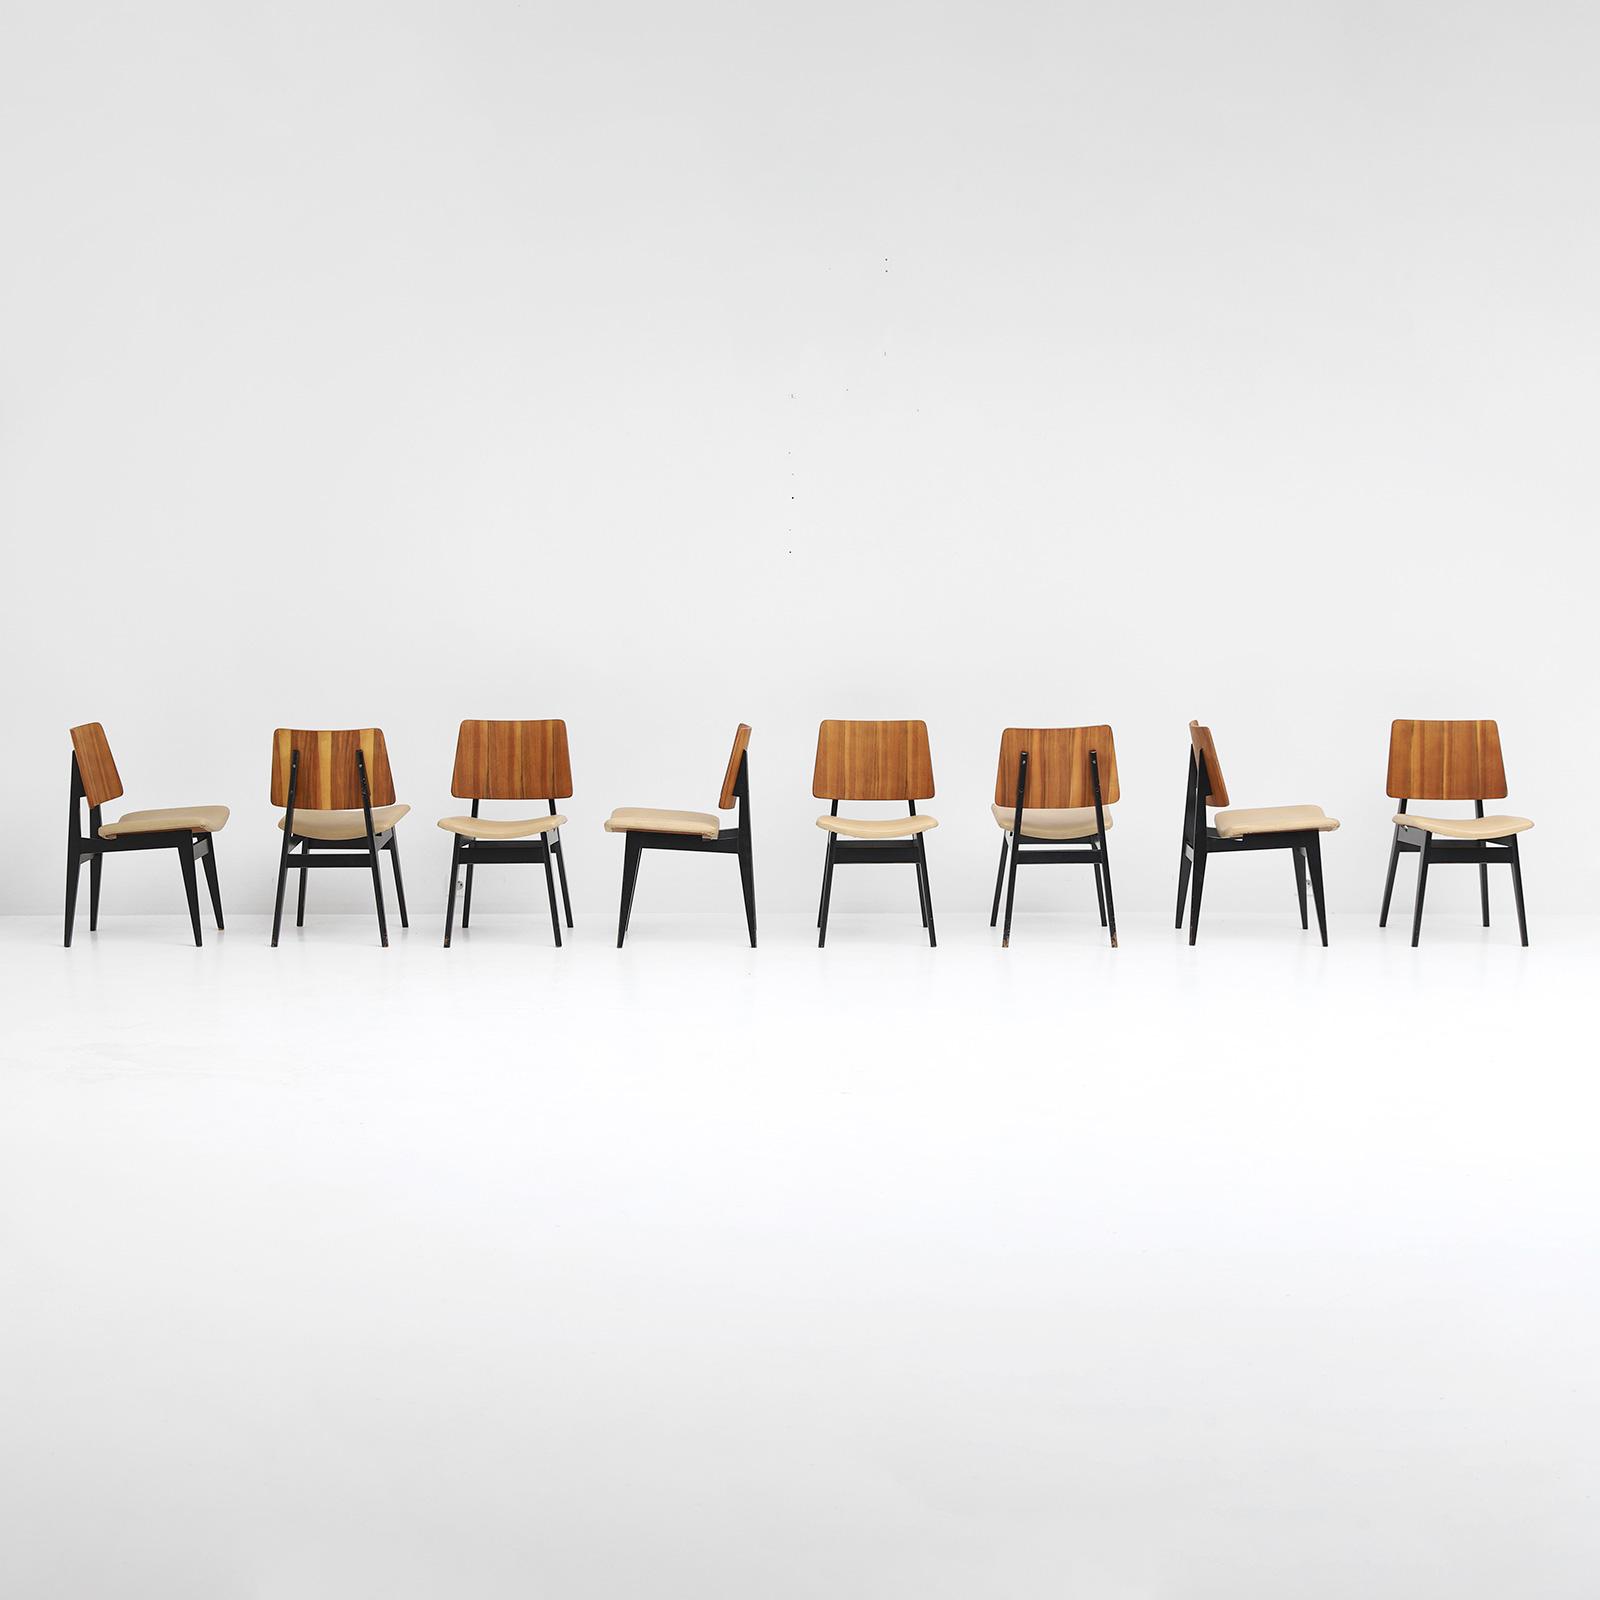 Luxus Jos De Mey Dining Chairs